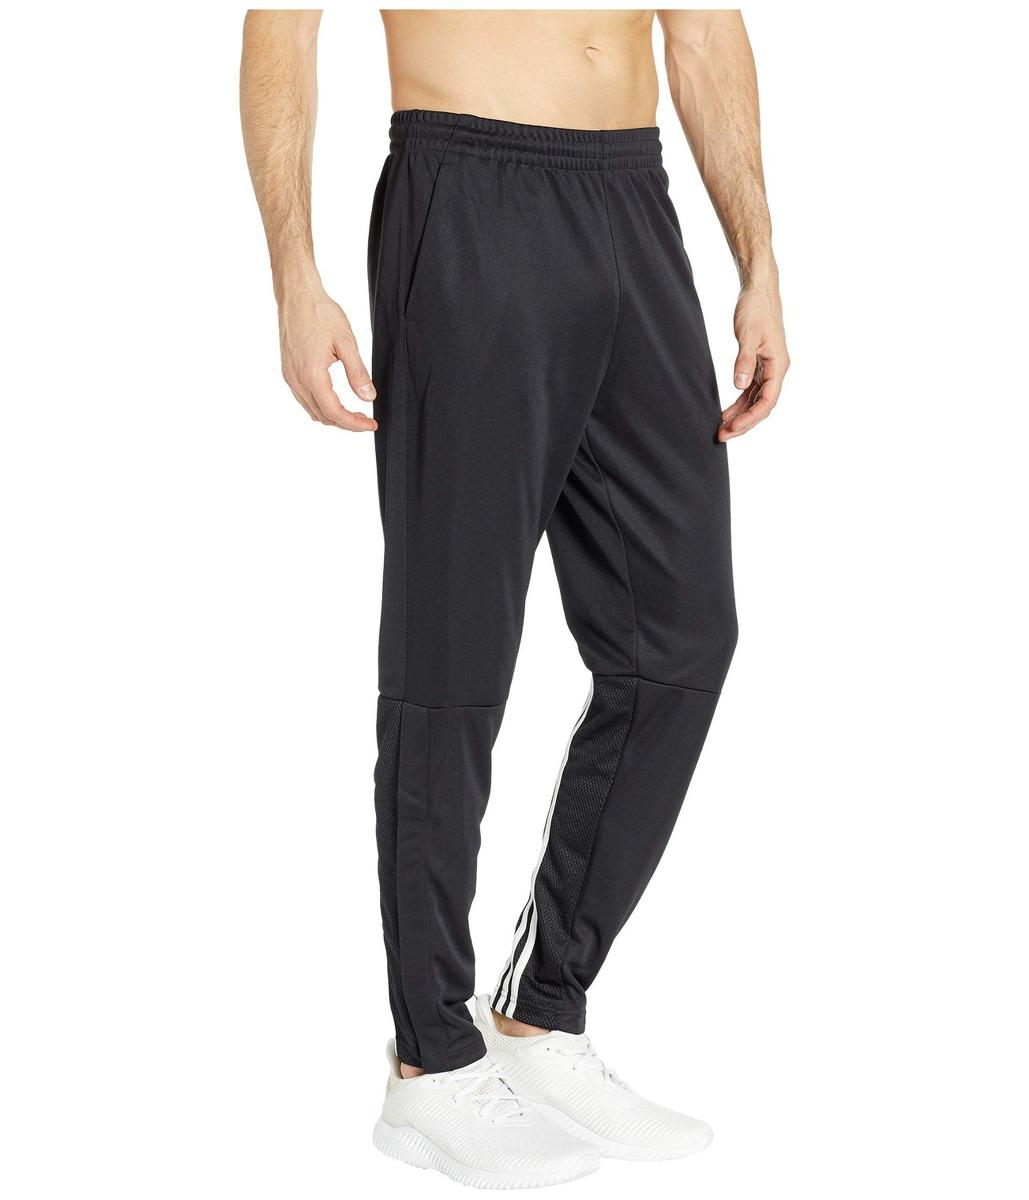 abe55aa426 Pantalon Hombre adidas Snap Pants - S  299